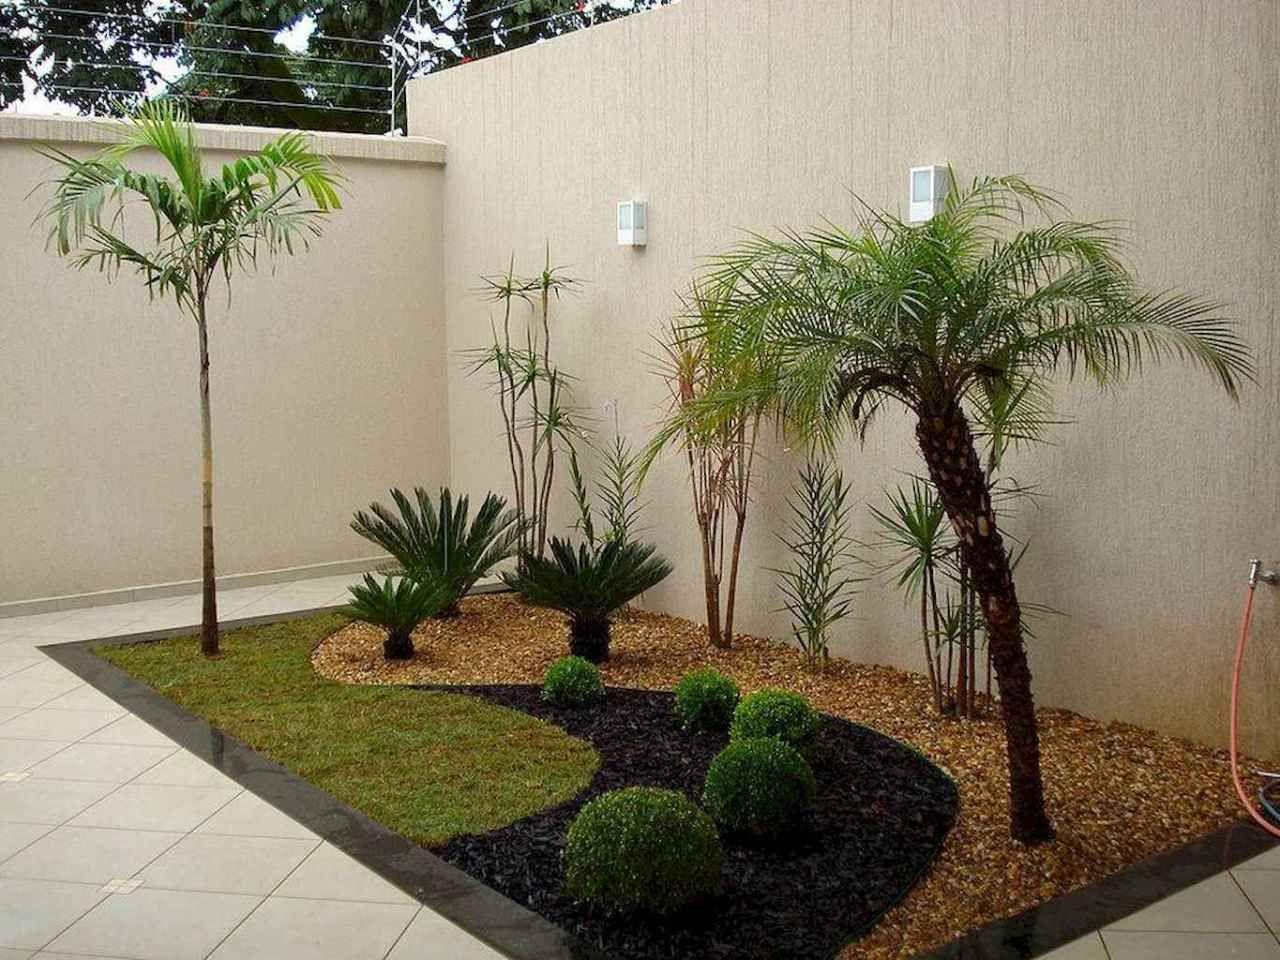 71 Beautiful Small Front Yard Landscaping Ideas Small Front Yard Landscaping Garden Landscape Design Urban Garden